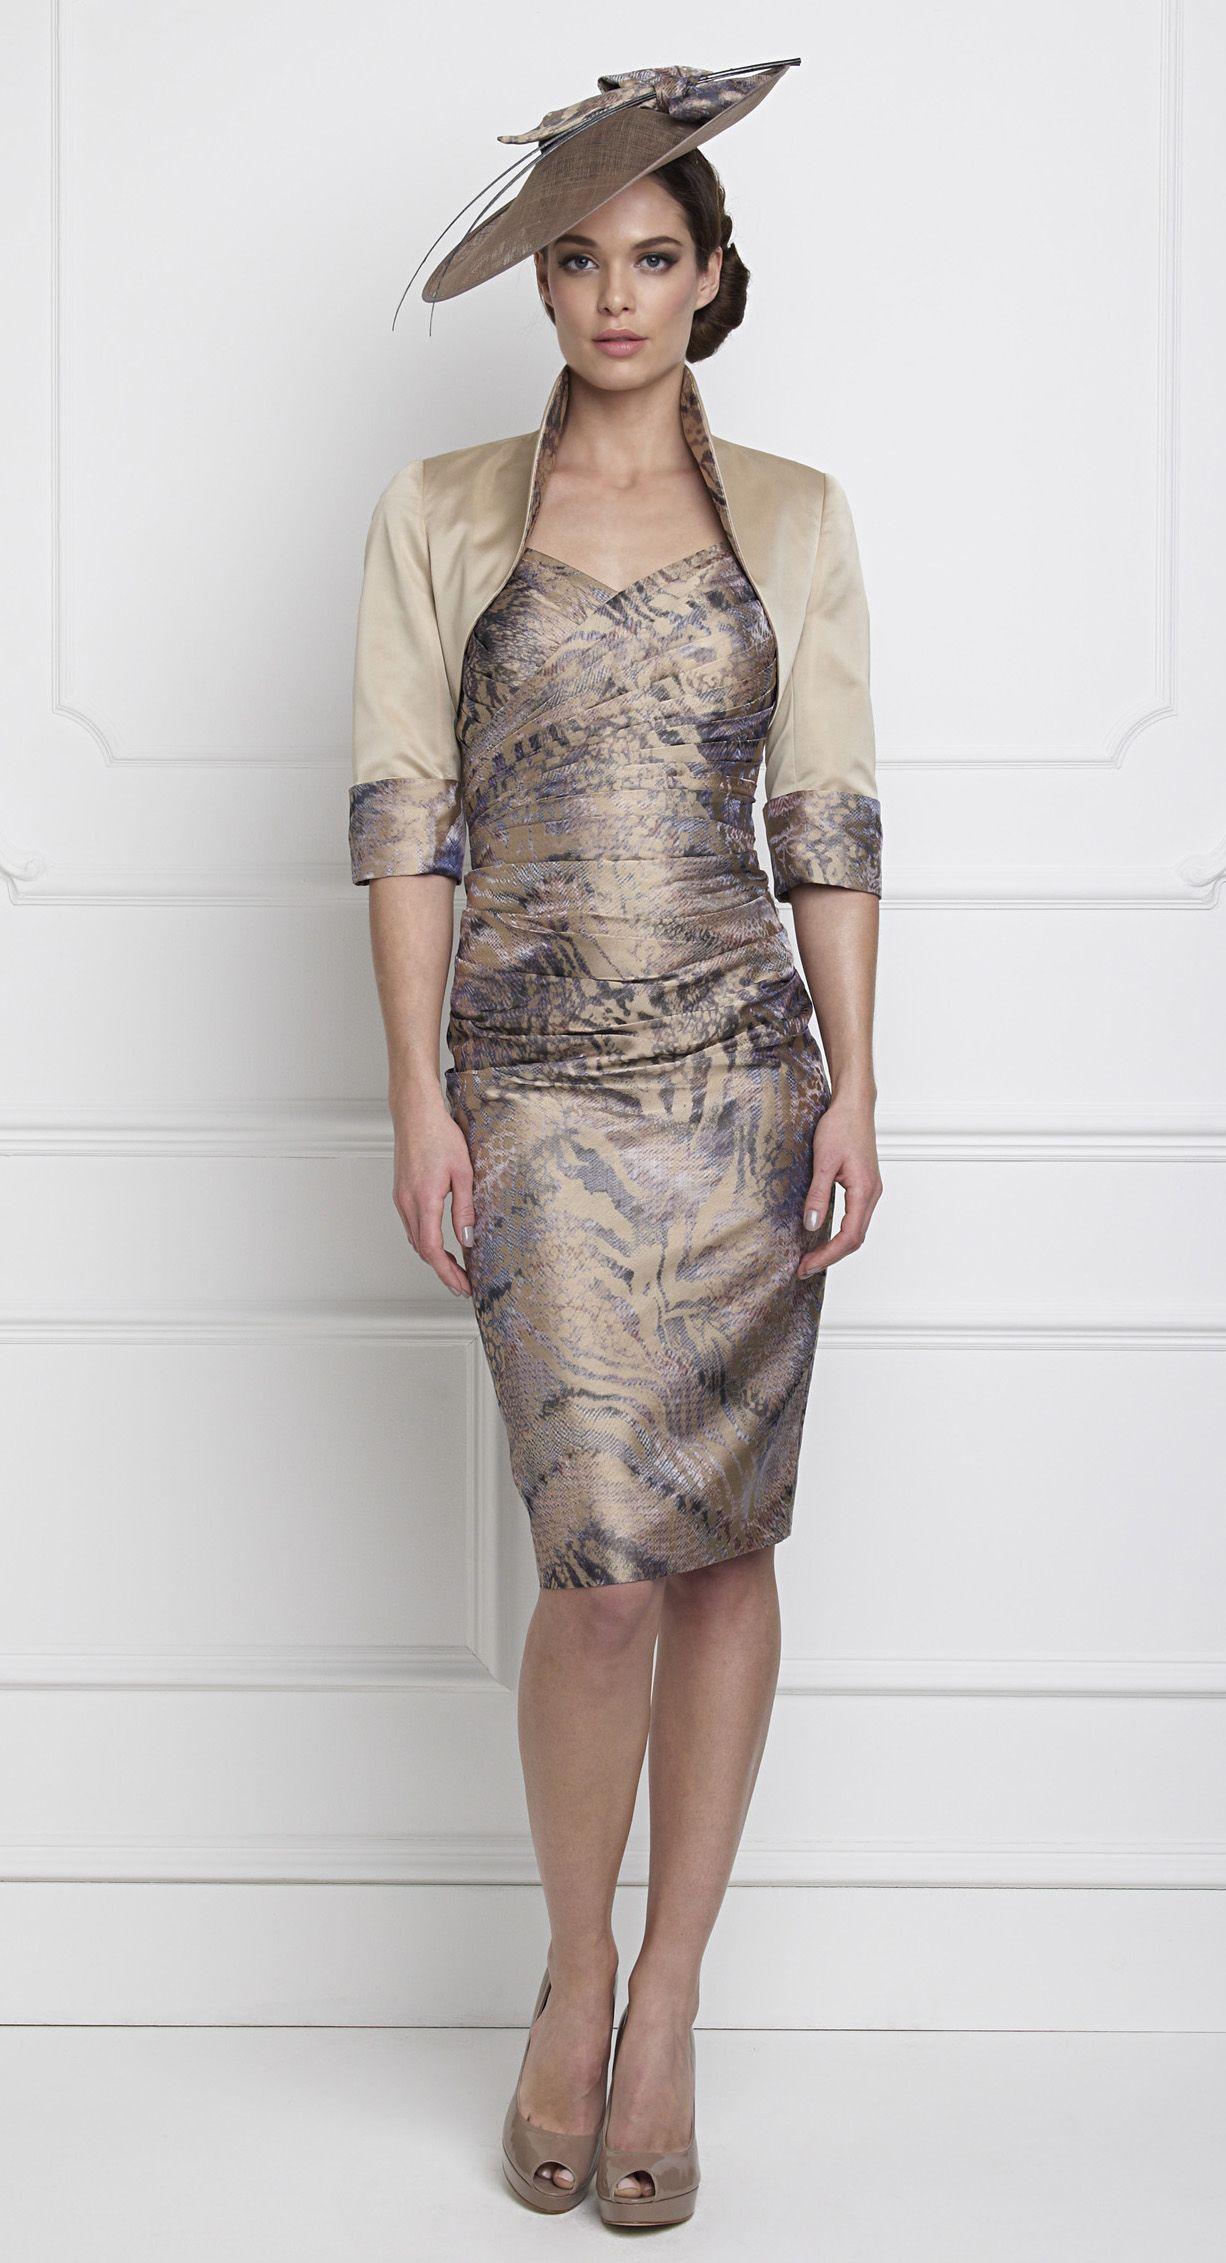 f4f6b91b81 <p>Simple , yet elegant copper dress and bolero jacket</p> <p><strong>Sizes  10-22</strong></p>